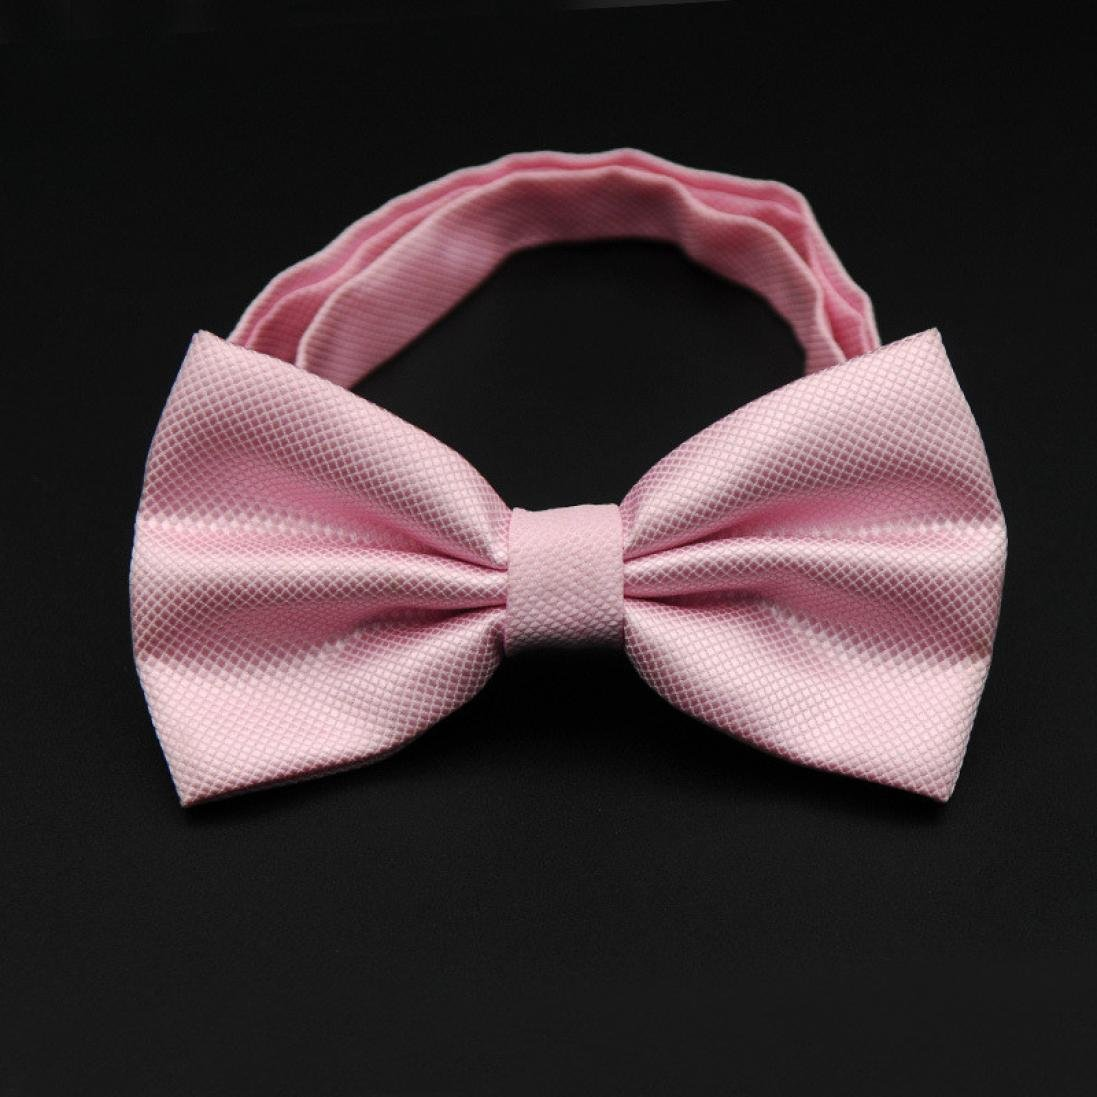 NEWONESUN Mens Butterfly Cravat bowtie Wedding commercial bow ties Accessories